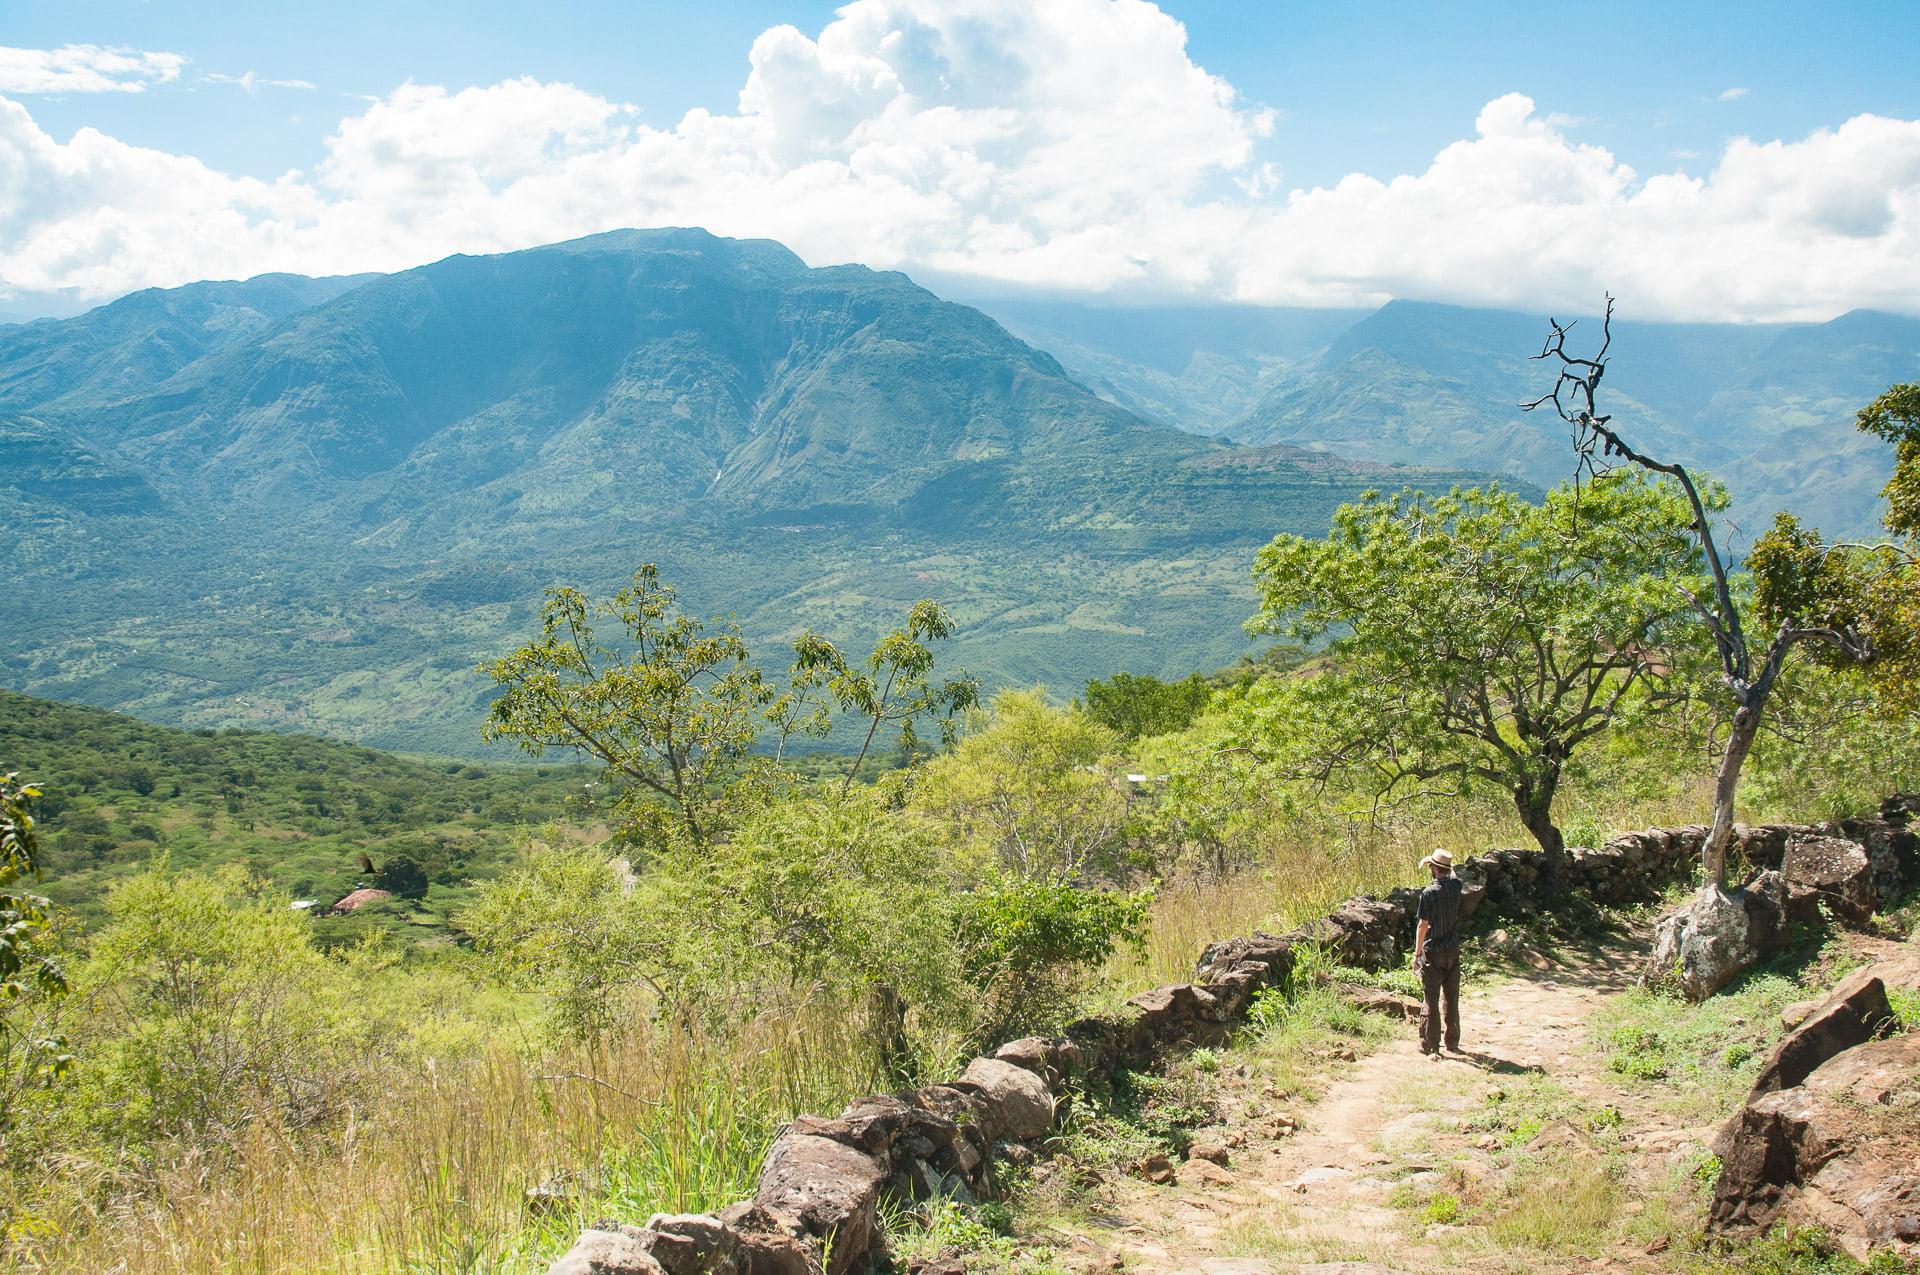 Barichara chemin guane - Les globe blogueurs - blog voyage nature